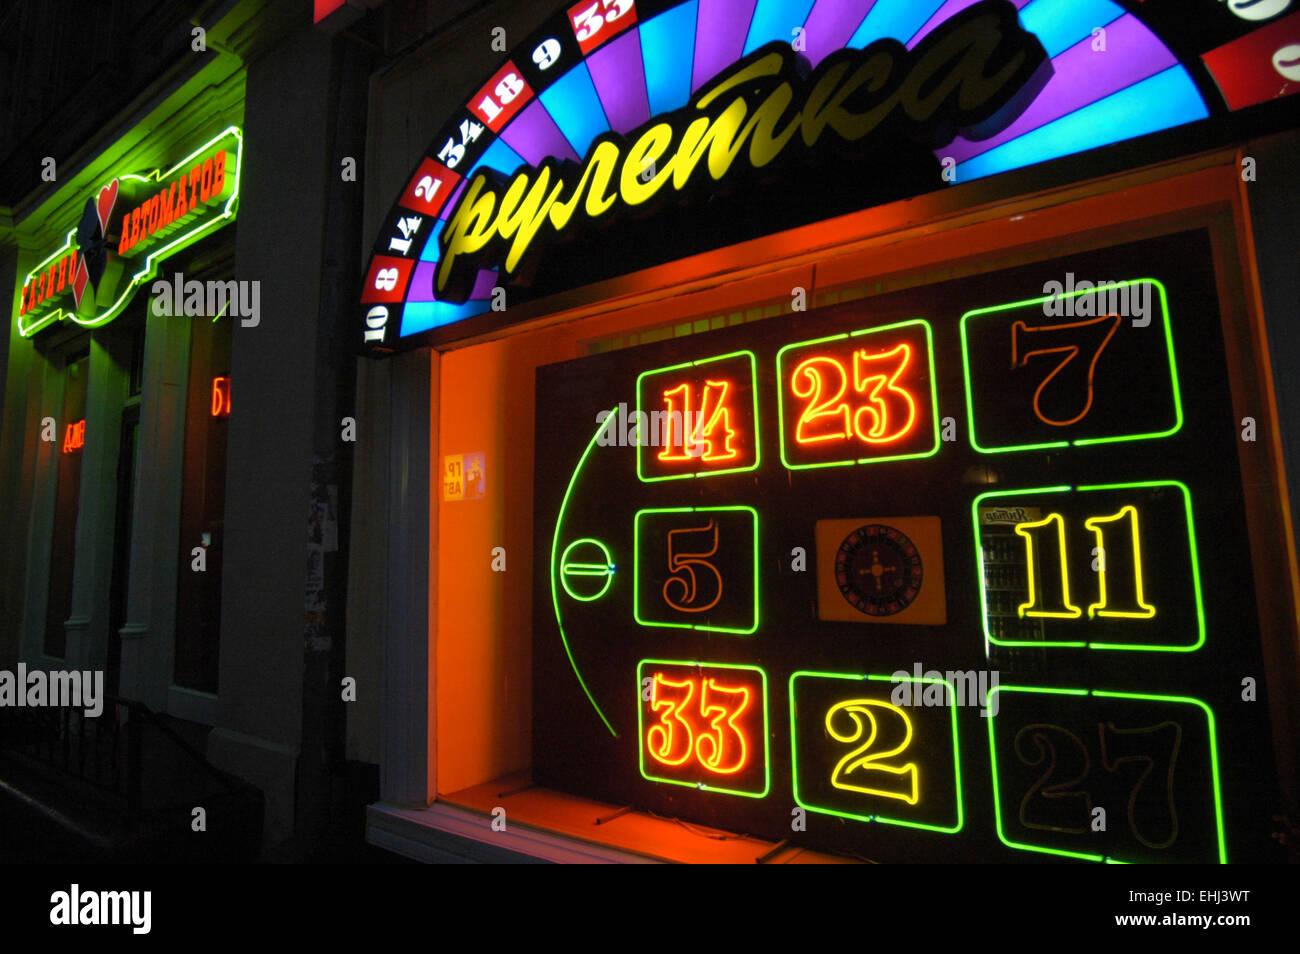 Esl grammar gambling